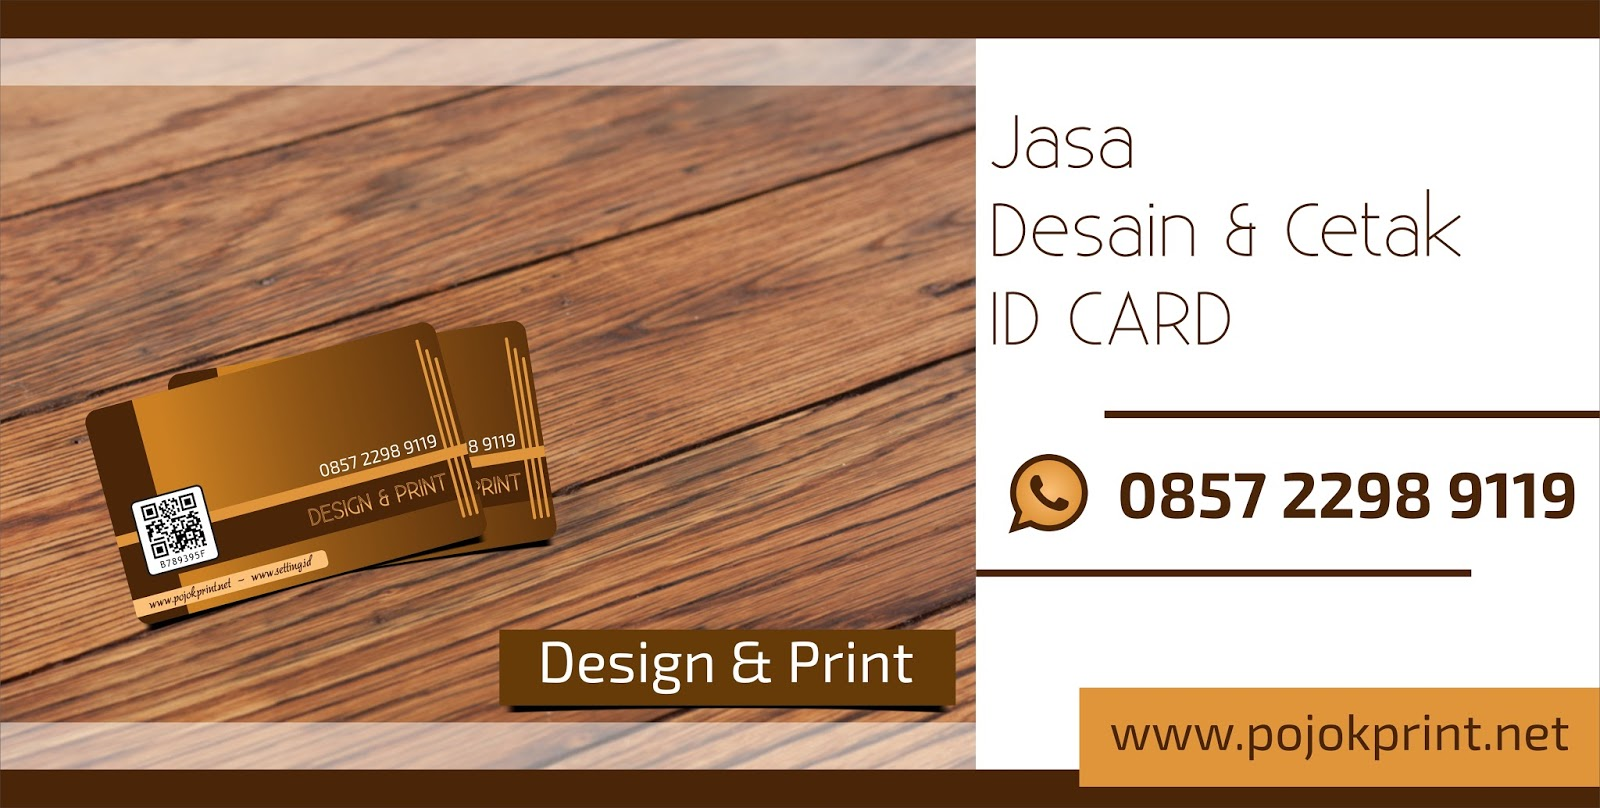 Jasa-Desain-&-Cetak-ID-Card